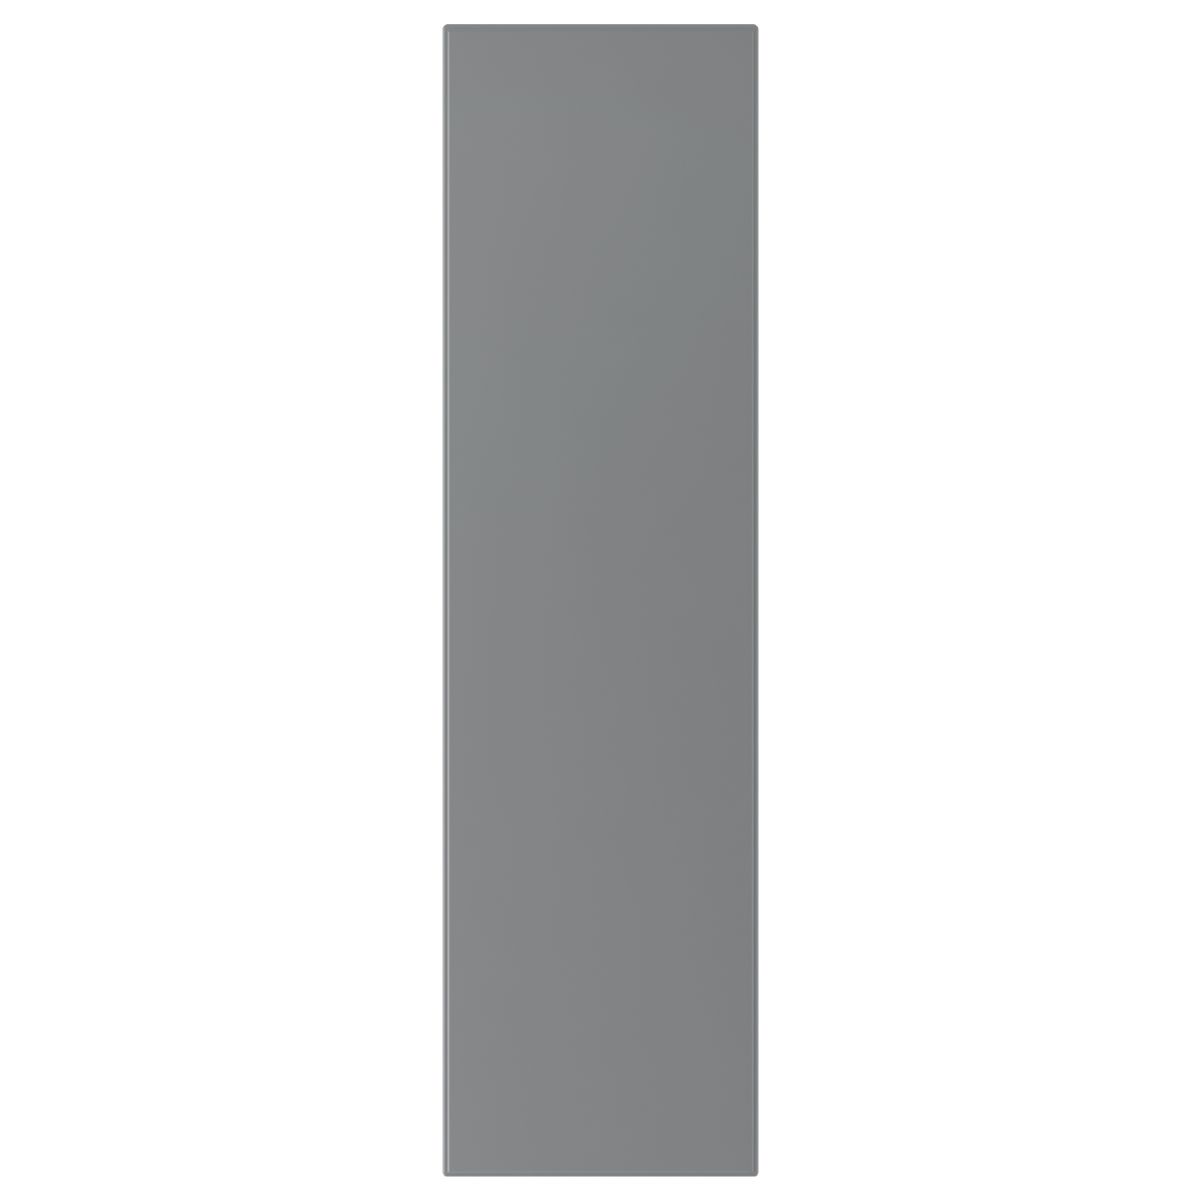 LAYMAN - LORA Panel 108/30 panel boczny szafka górna